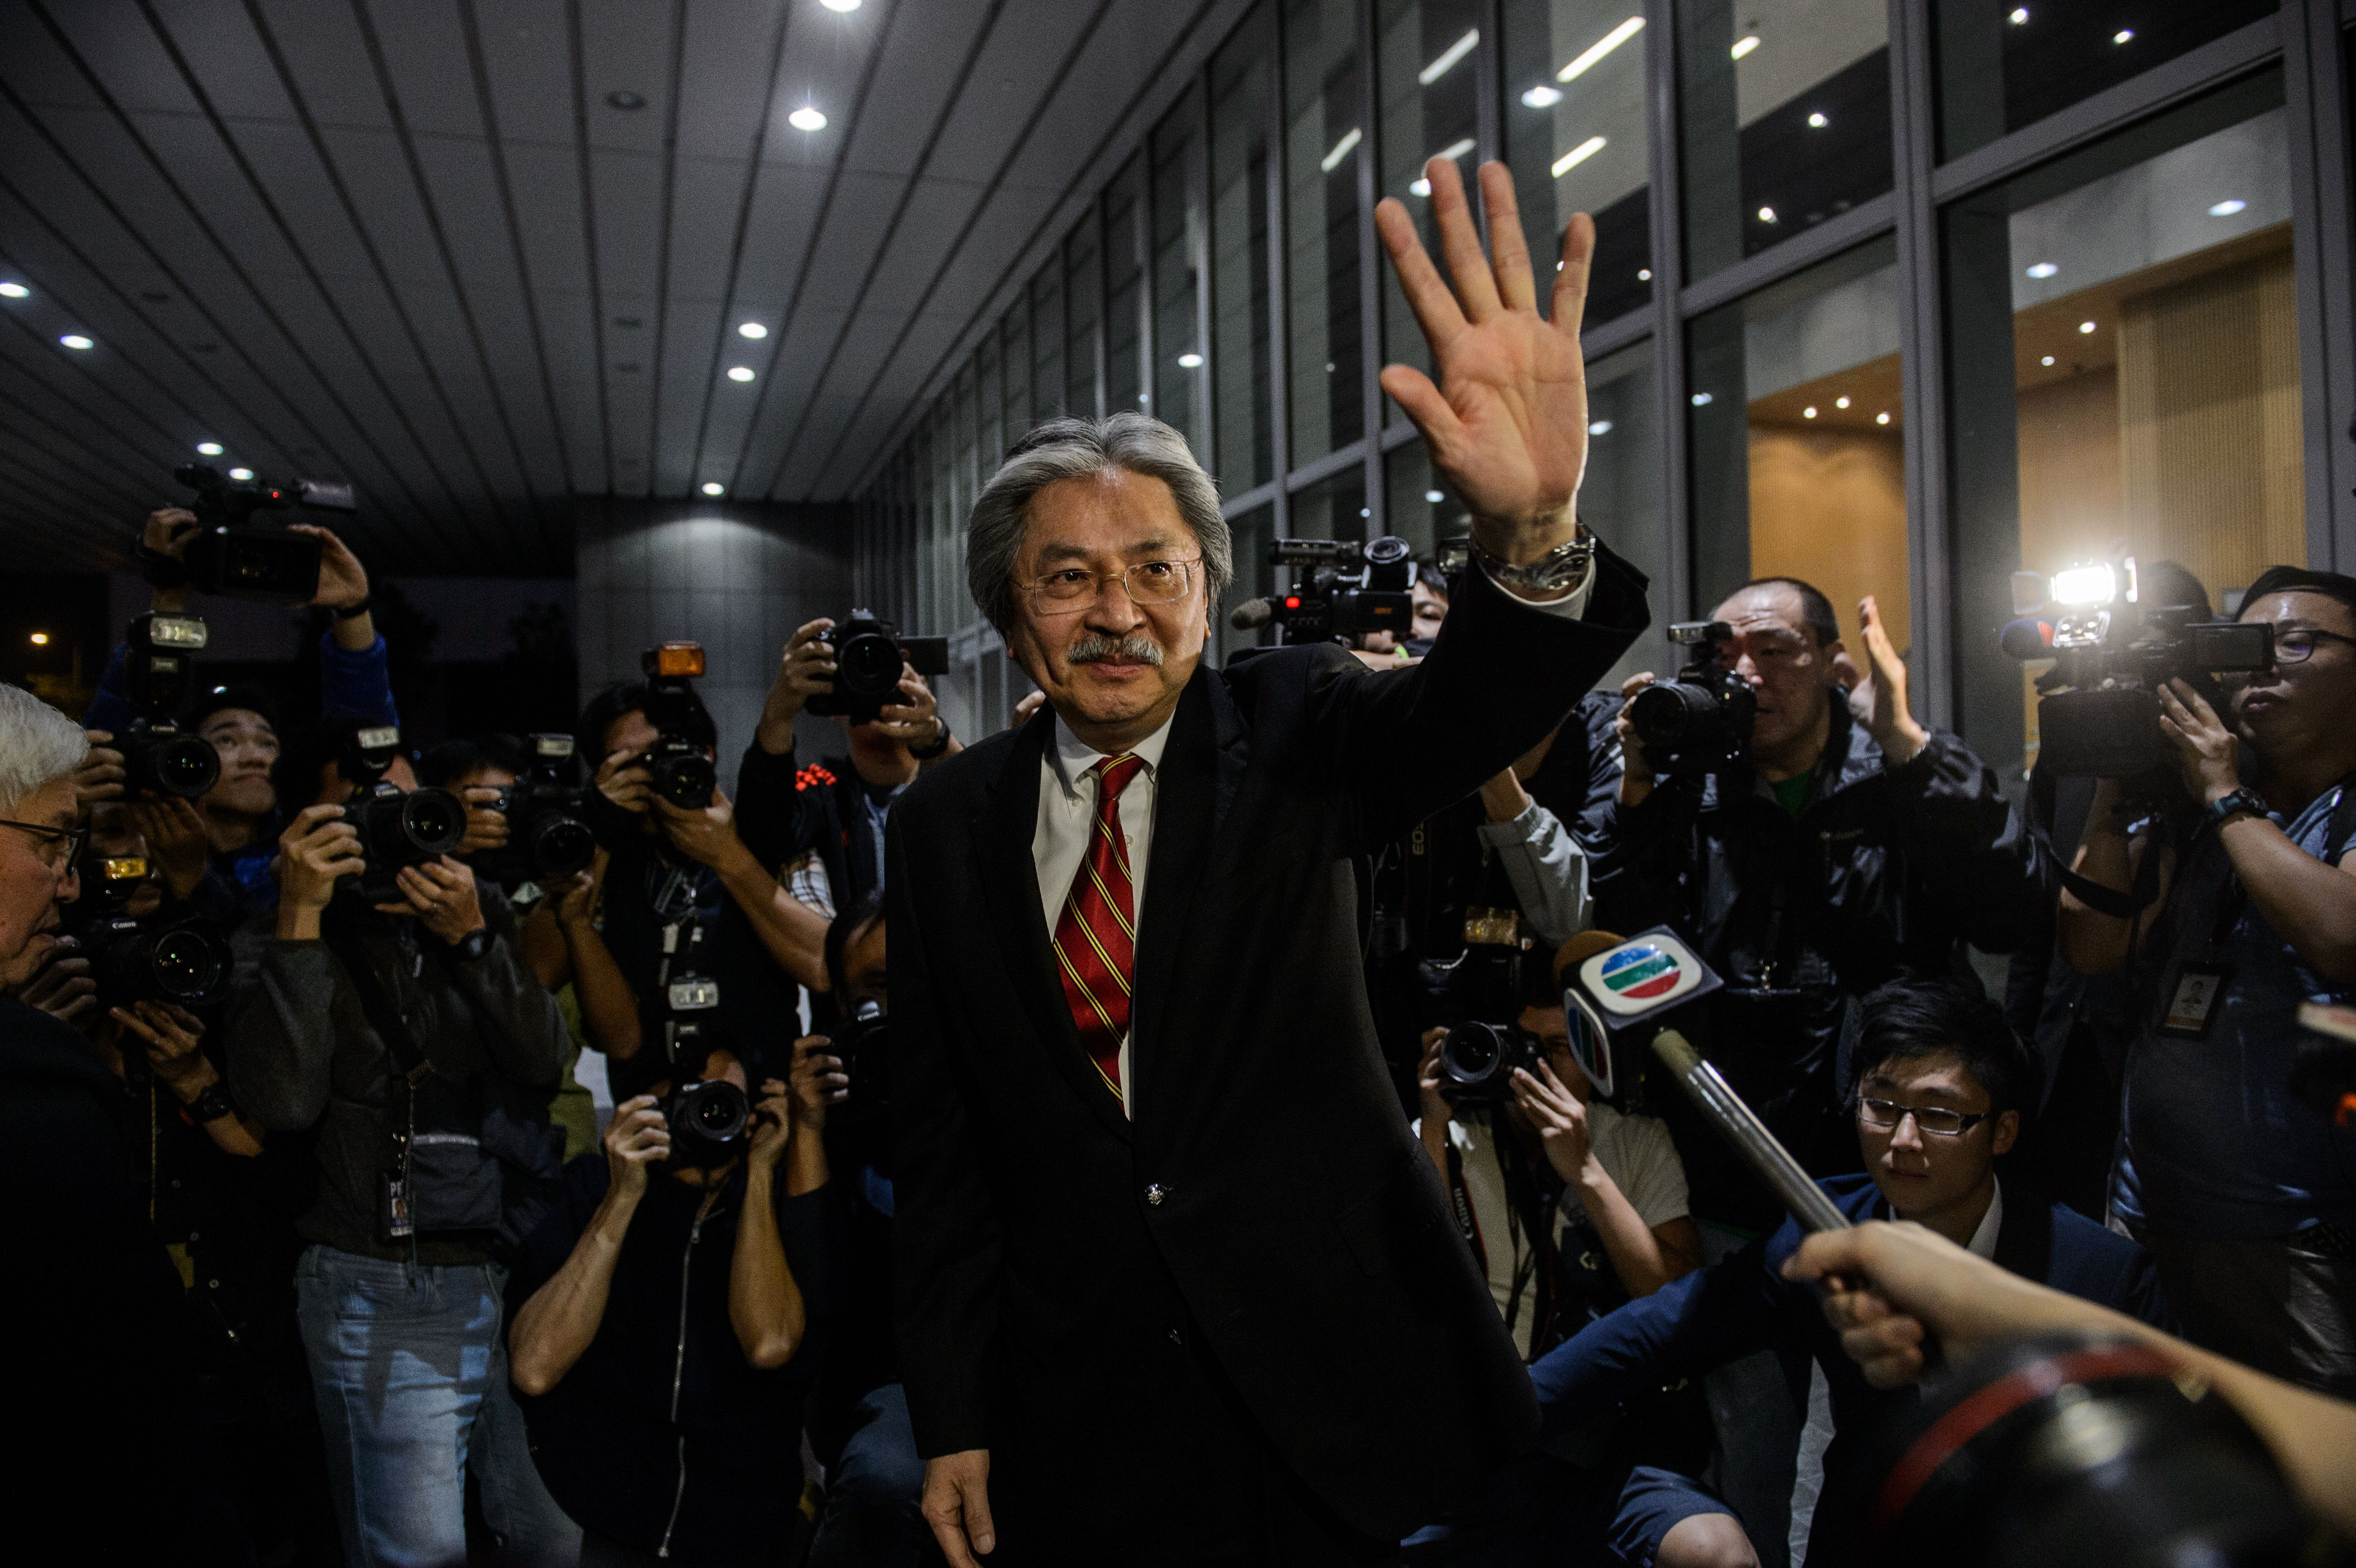 Hong Kong's former Financial Secretary John Tsang waves as he leaves a press conference to announce his resignation in Hong Kong on Dec. 12, 2016